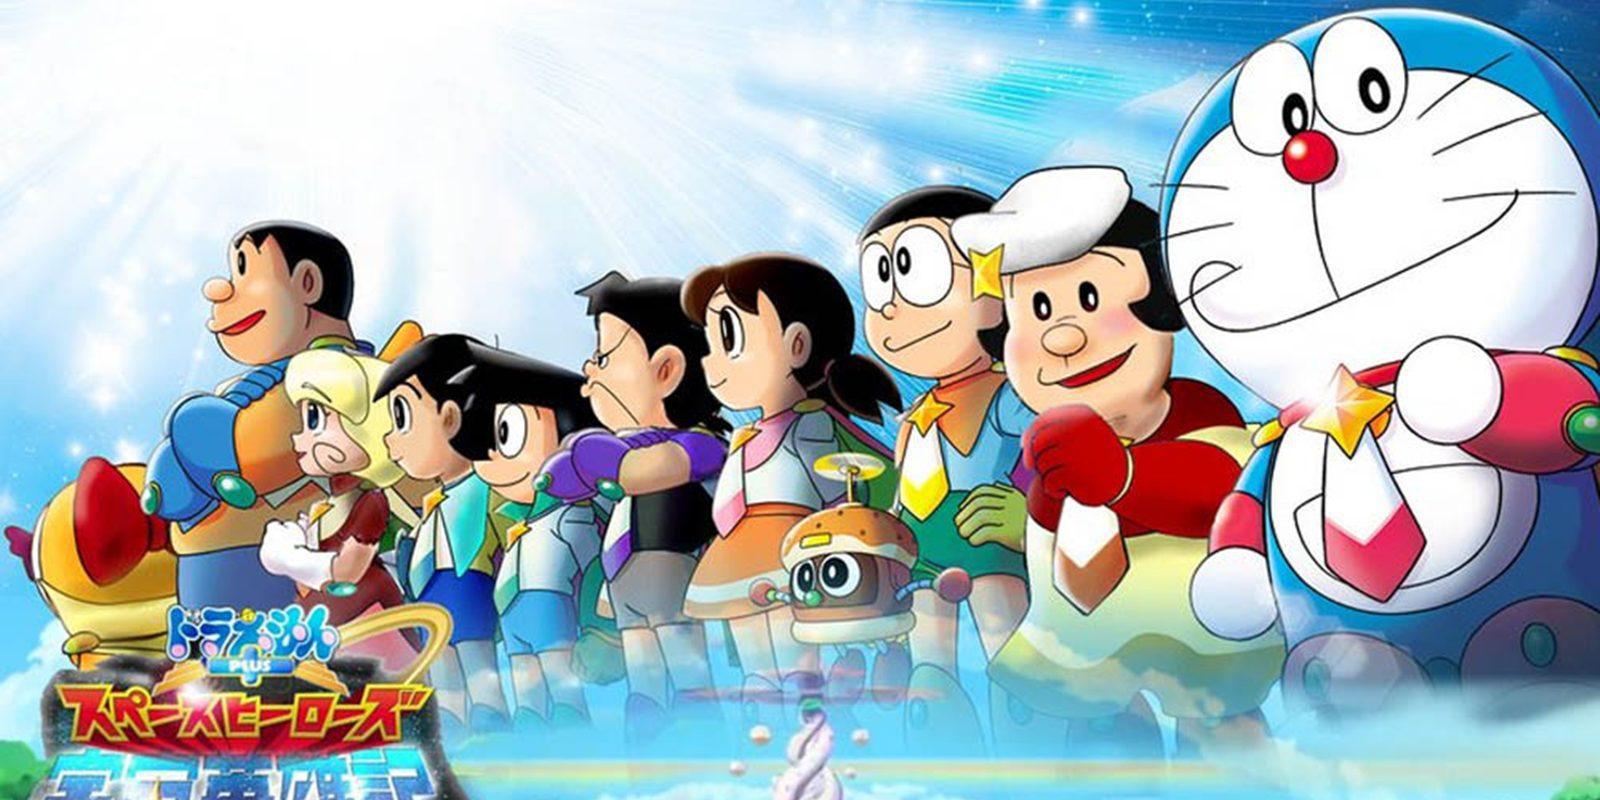 Stand By Me Doraemon 3d Wallpaper Fiesta De Doraemon Y Boing En Madrid Este Fin De Semana